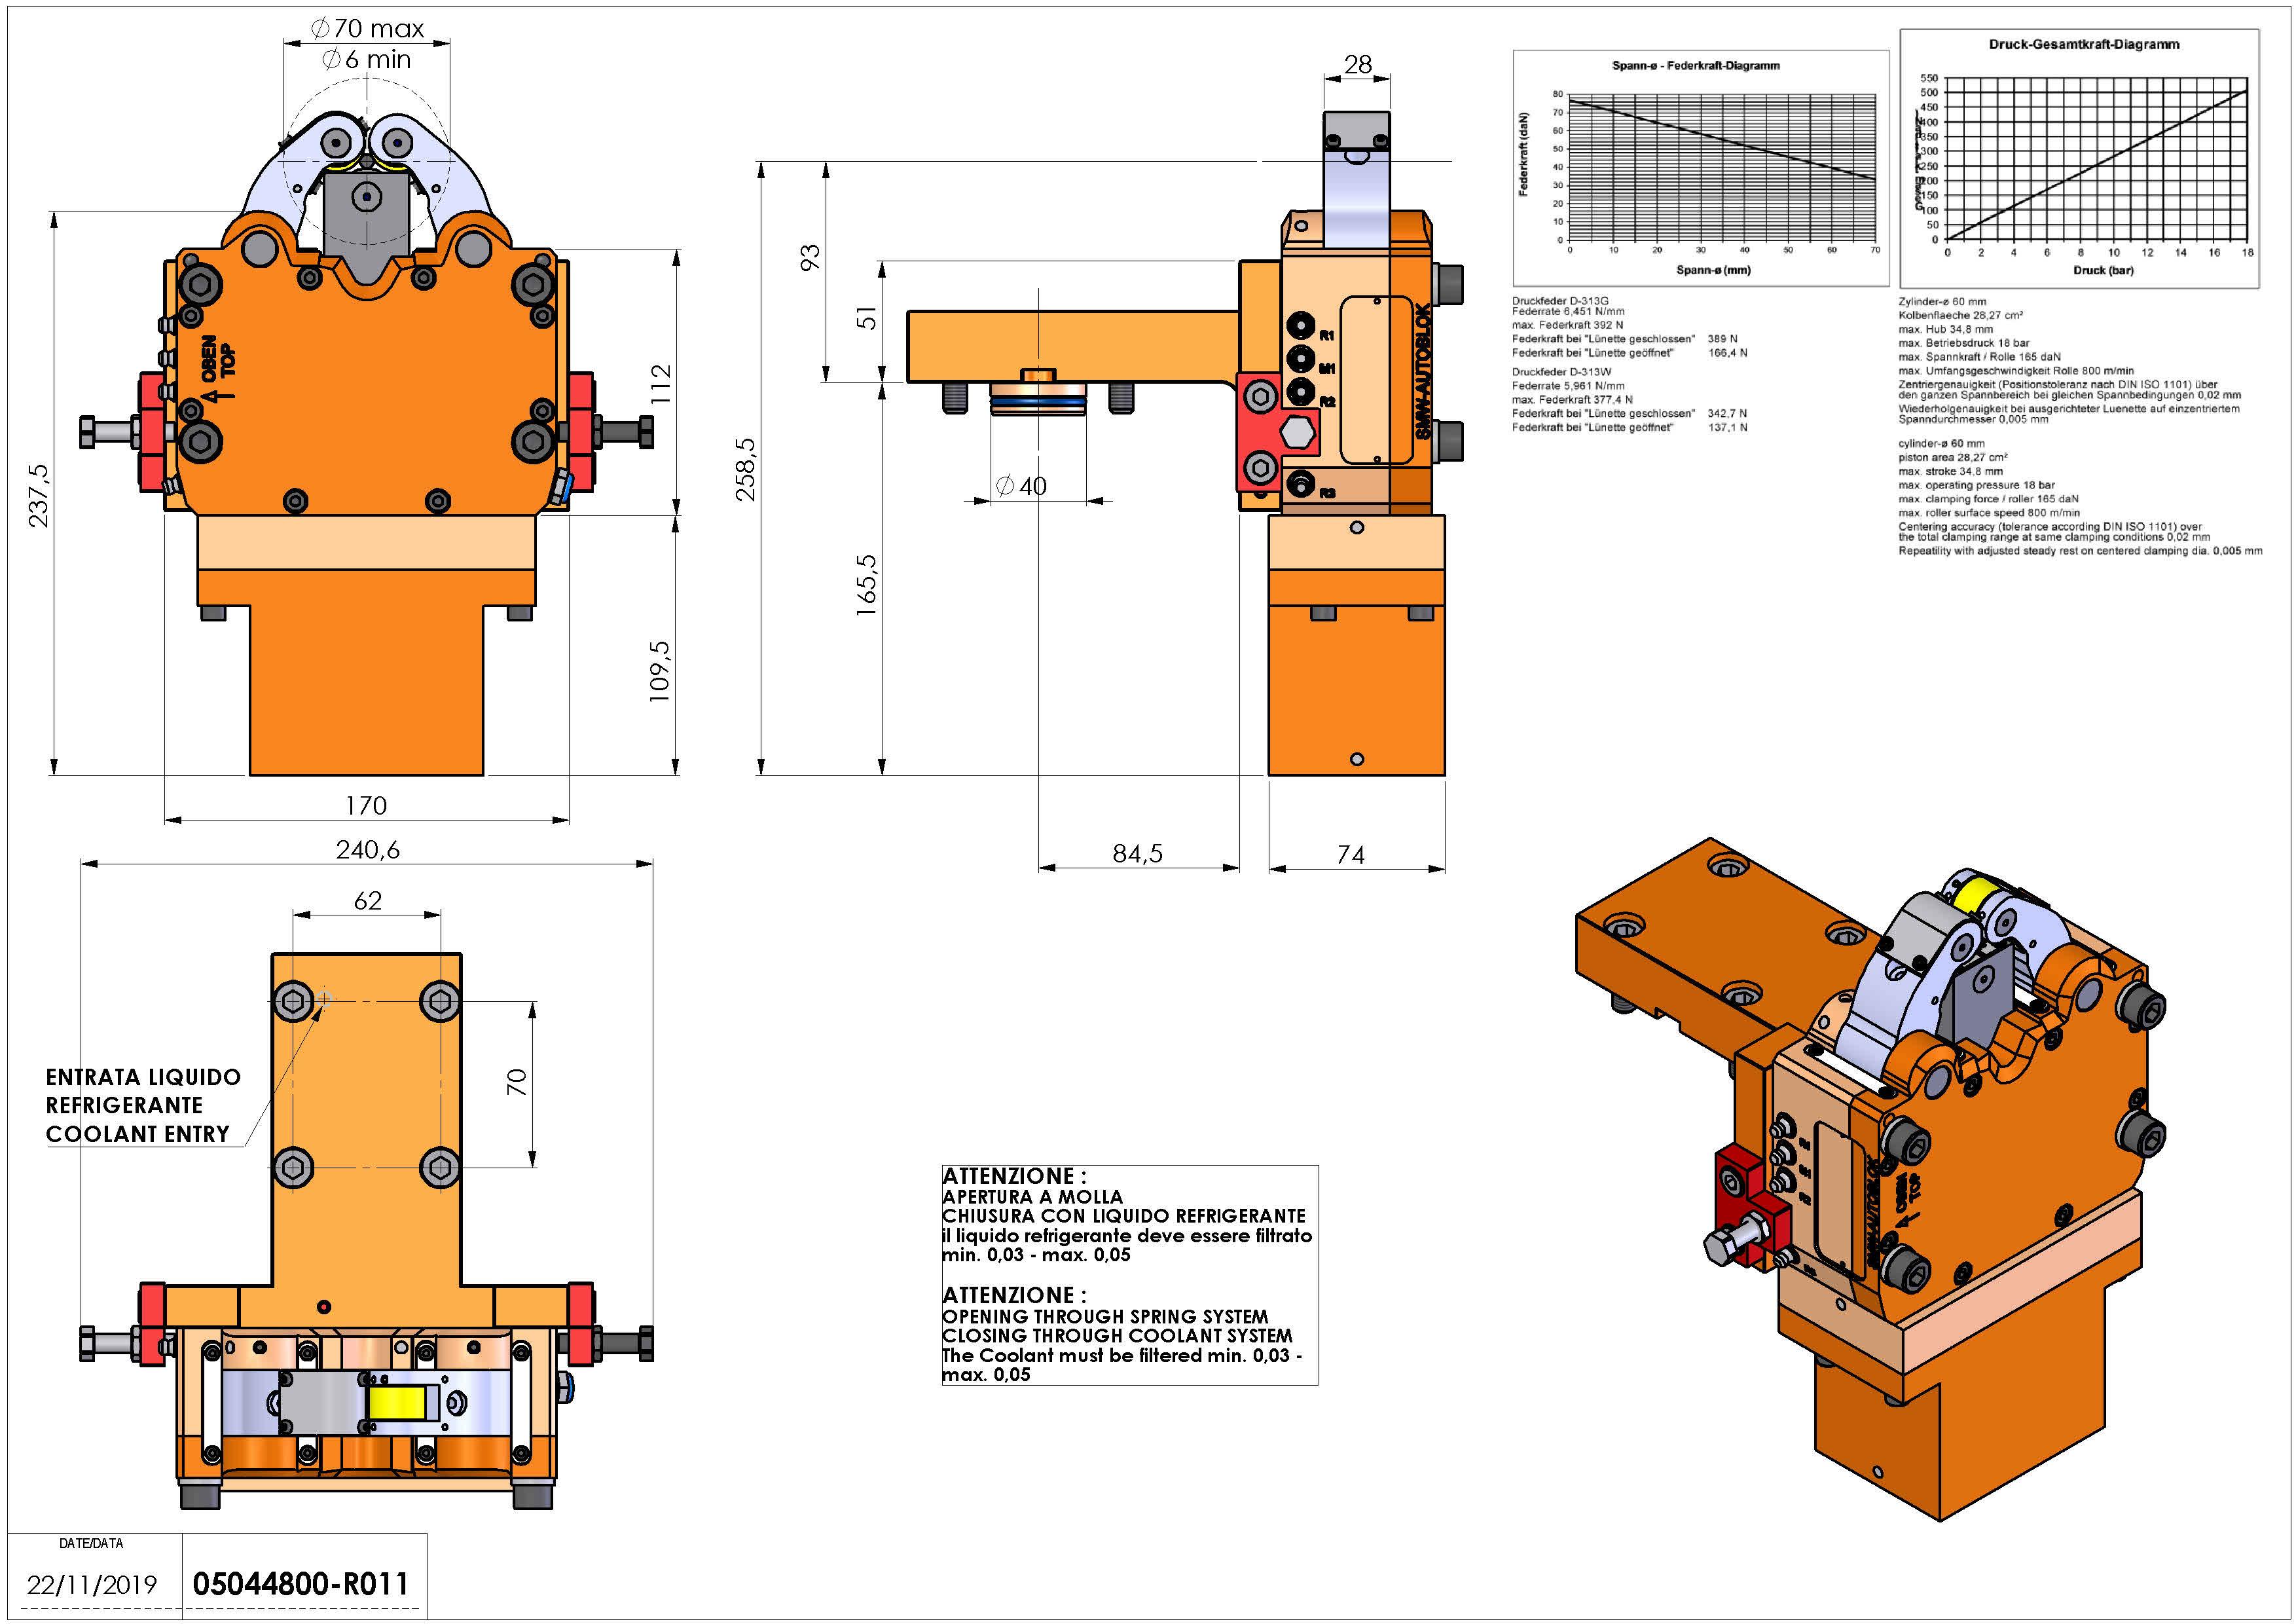 Technical image - LUNETTA D40 D6-70 SLU-X-1M H93.